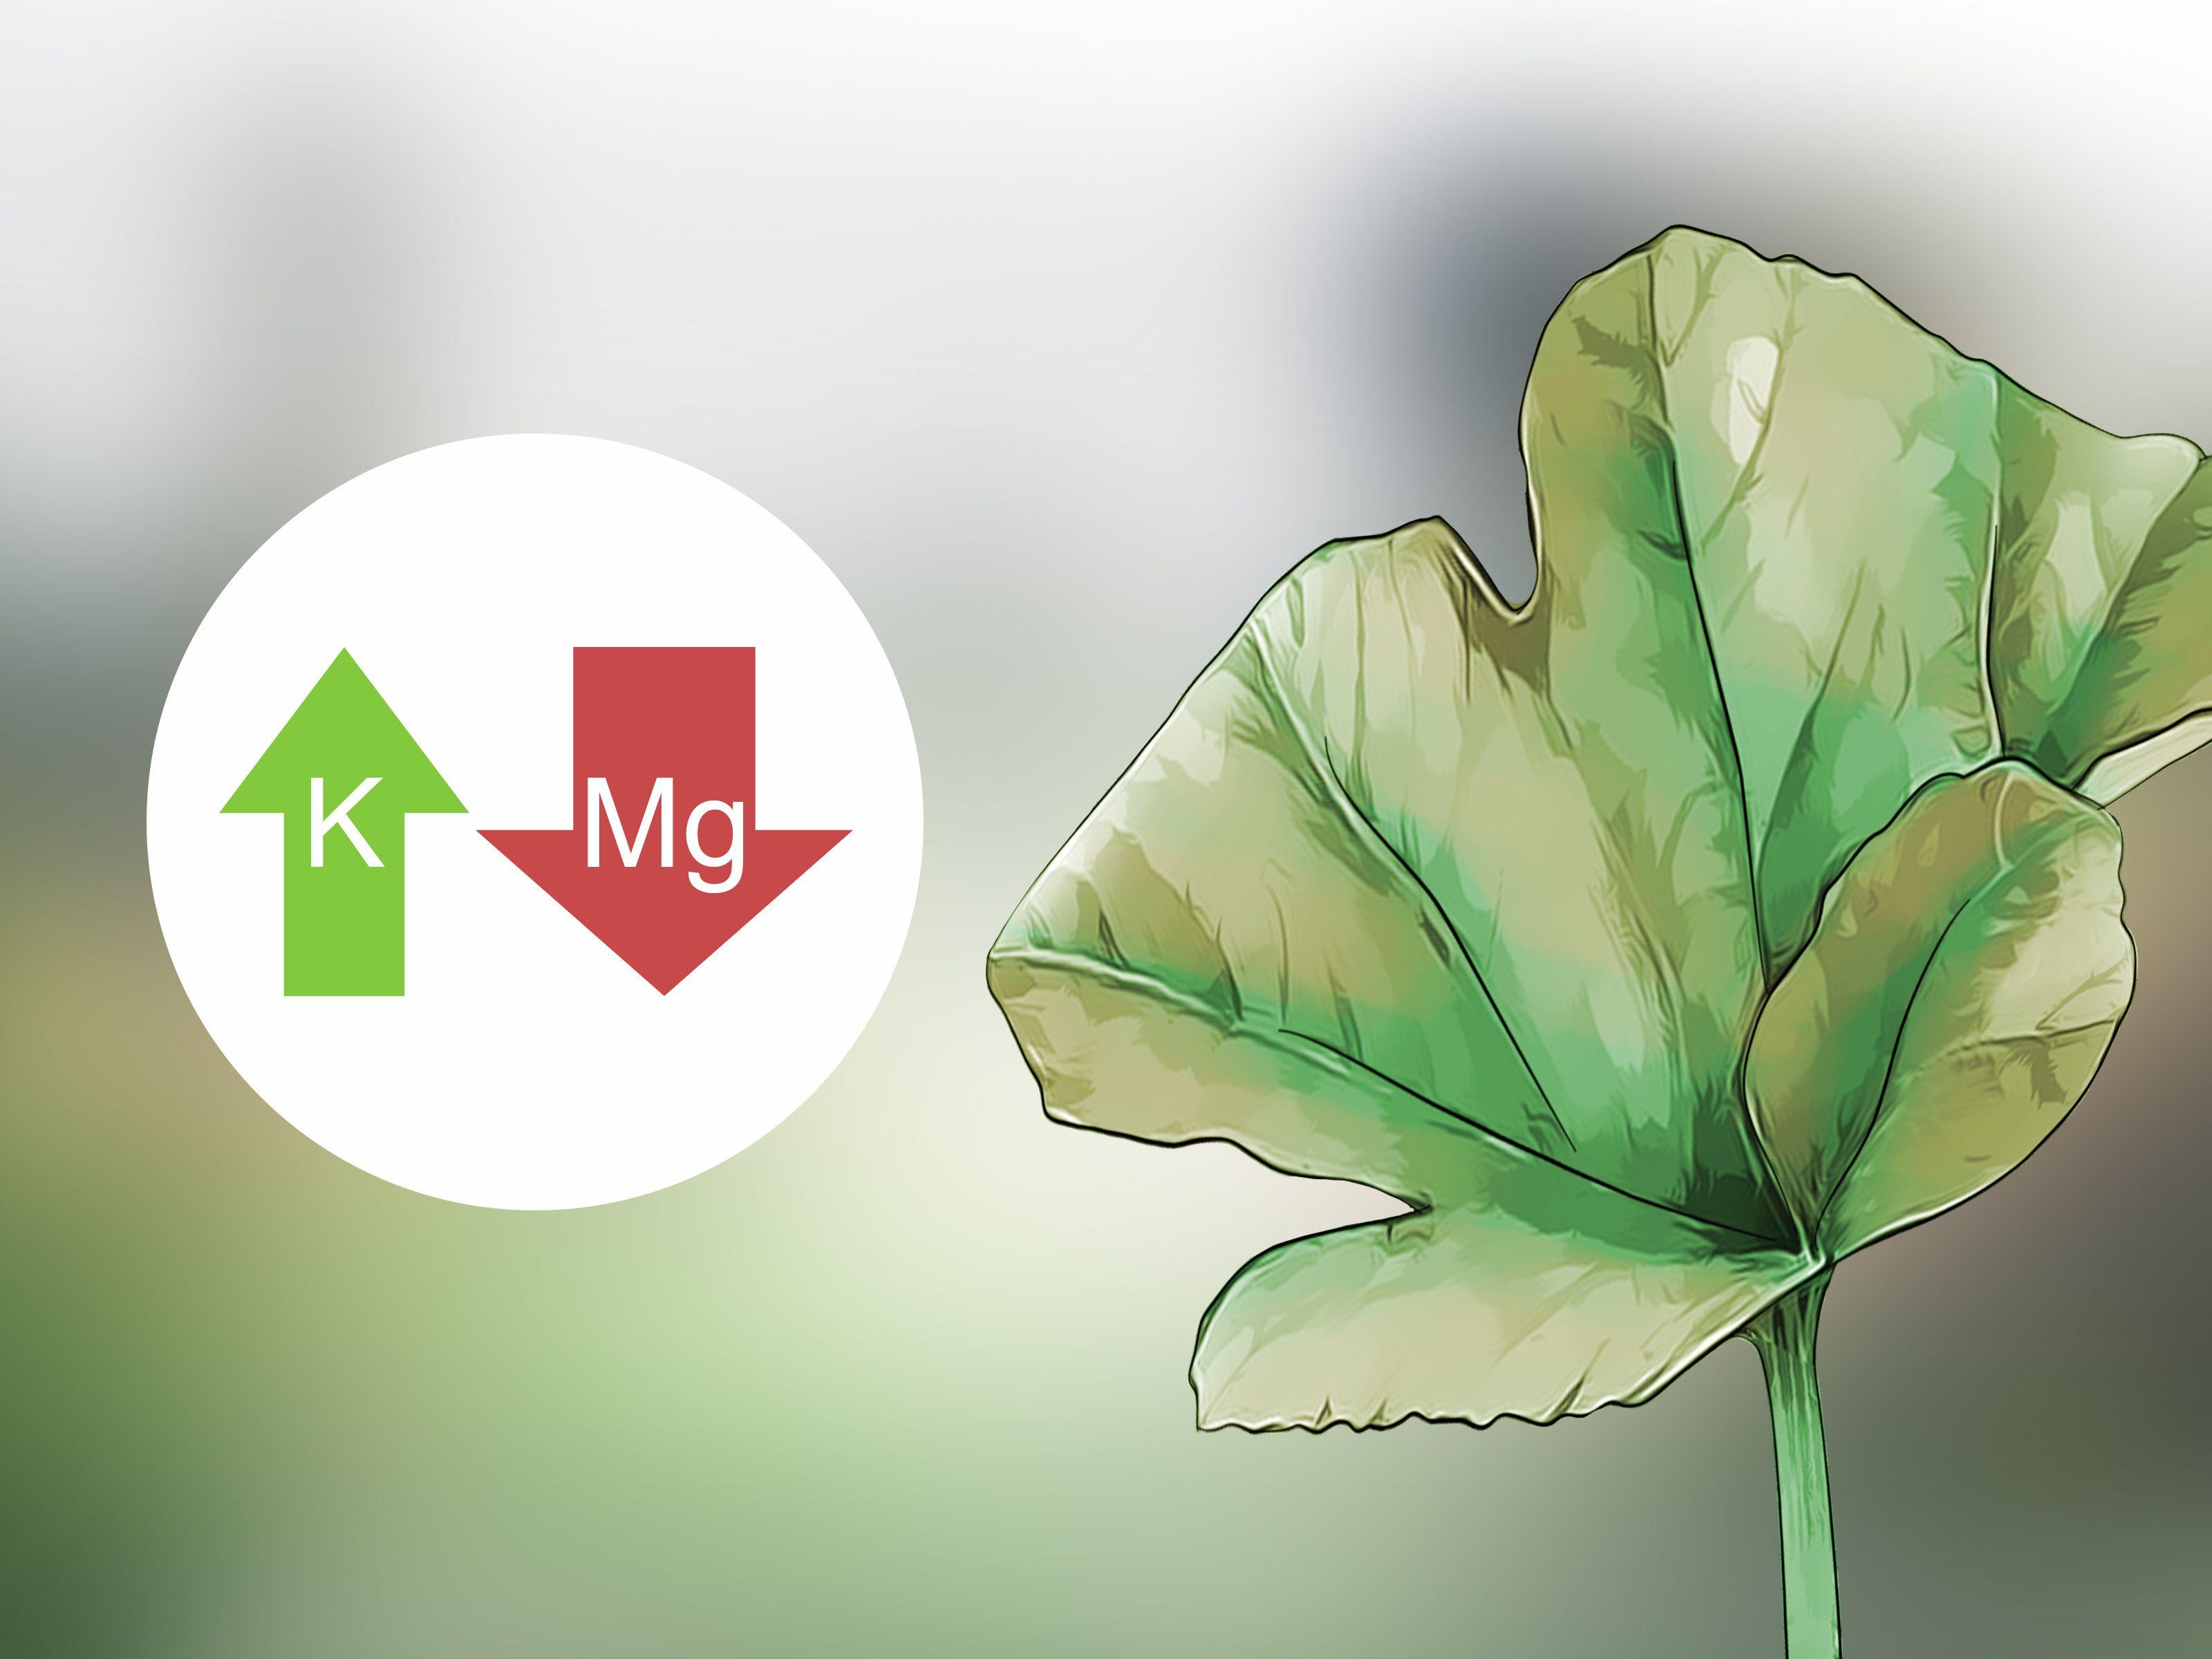 Add potassium to an organic garden plant needs organic